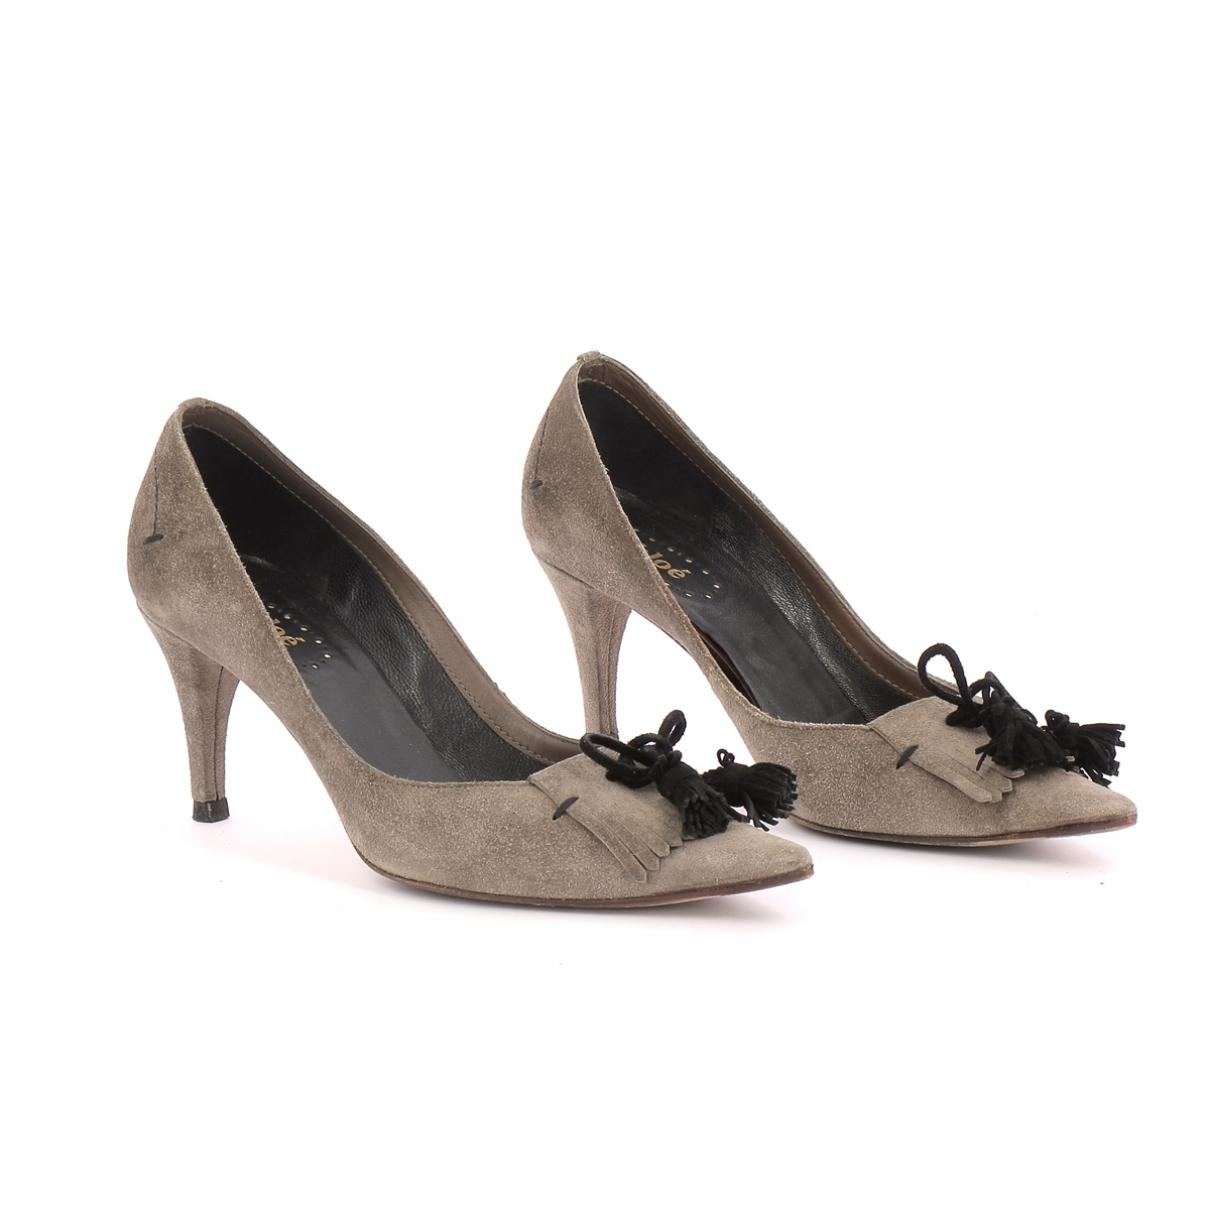 Chloé \N Grey Suede Heels for Women 36 EU